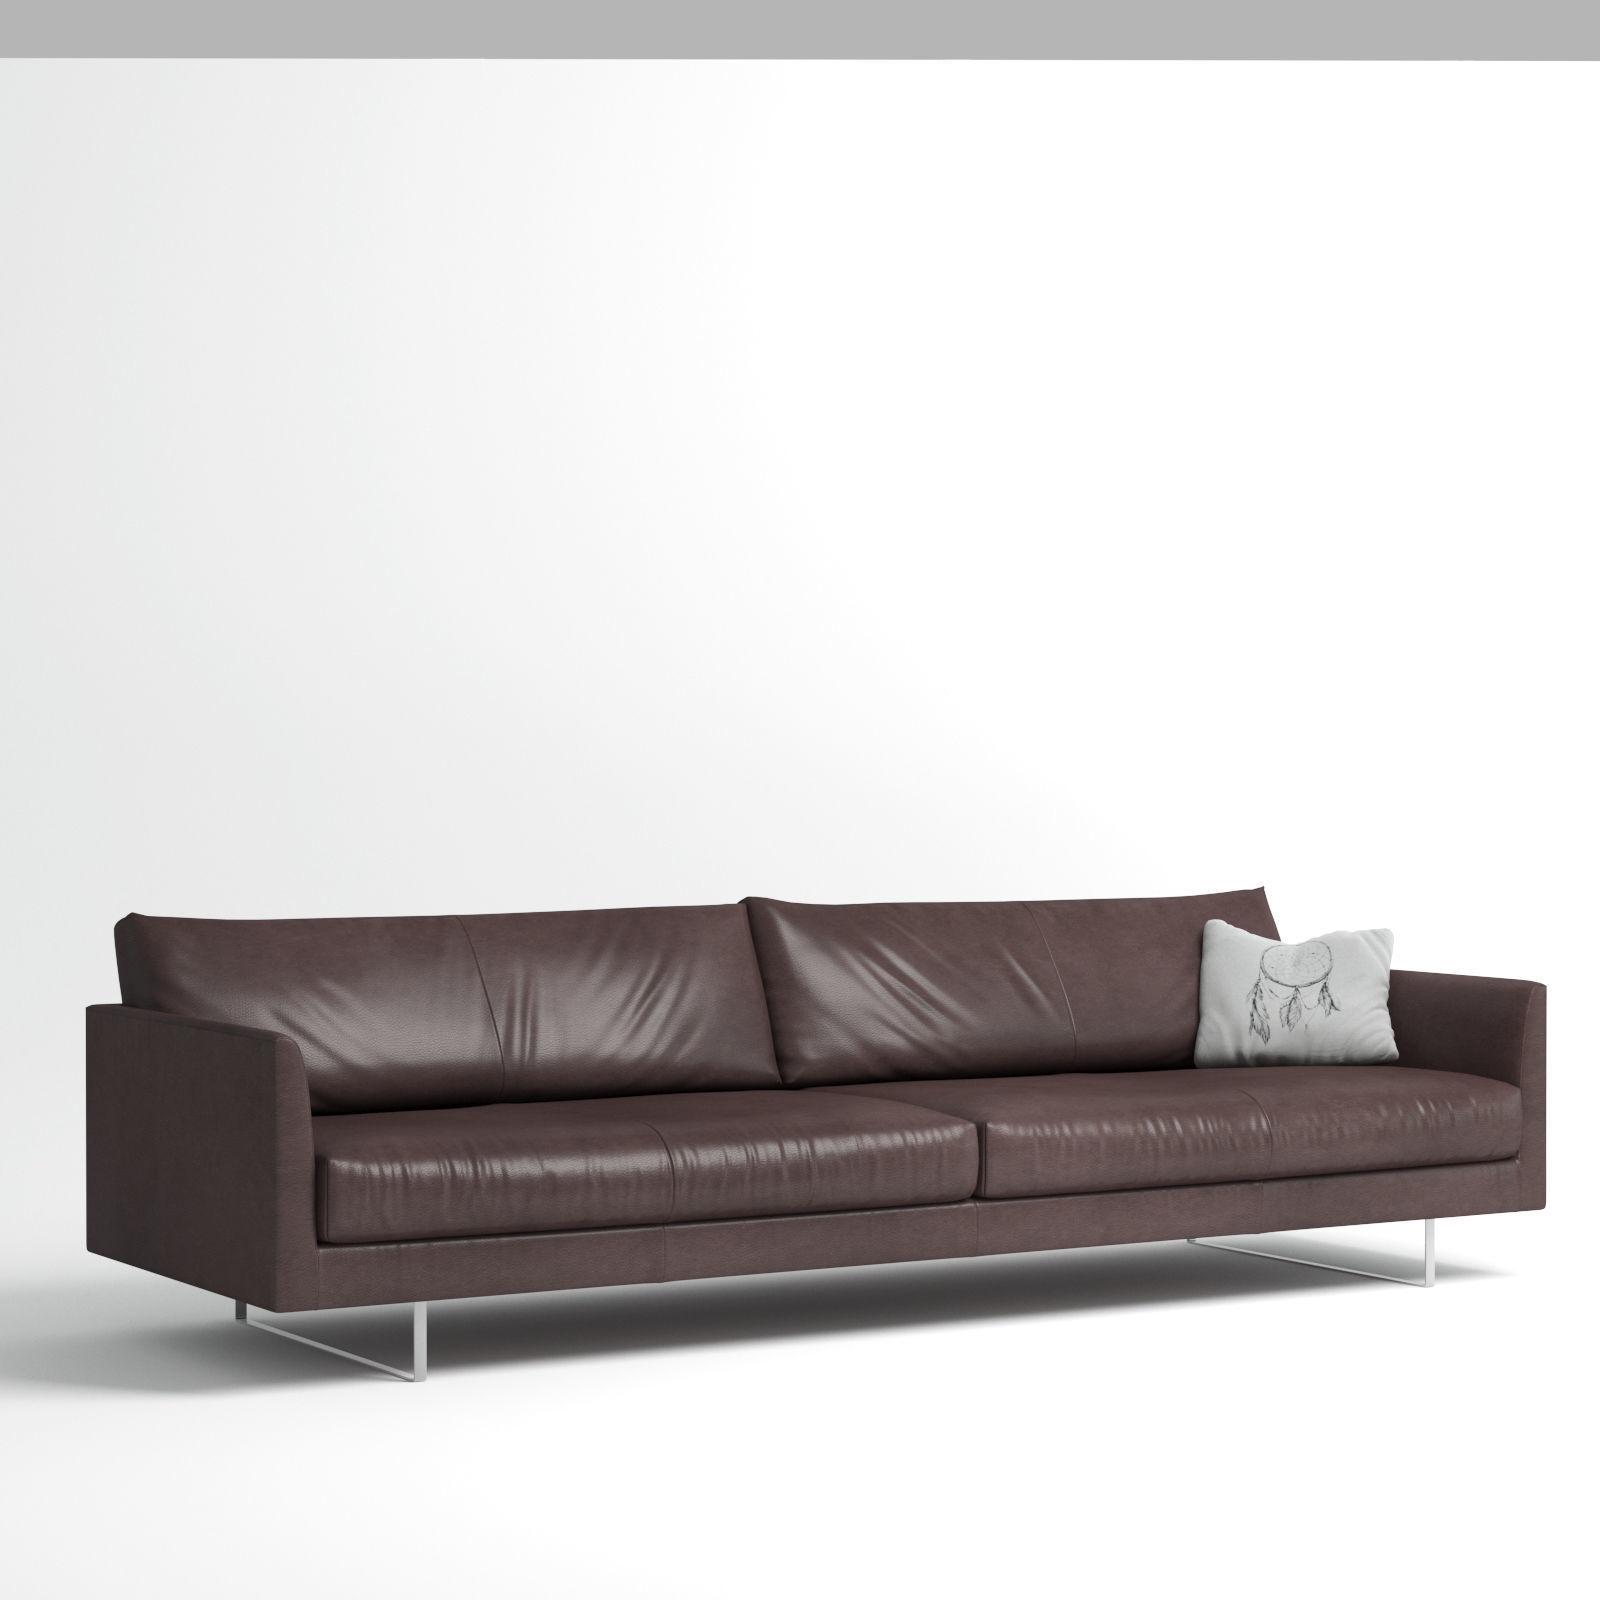 axel-5-seat-sofa-gijs-papavoine-montis 3D | CGTrader